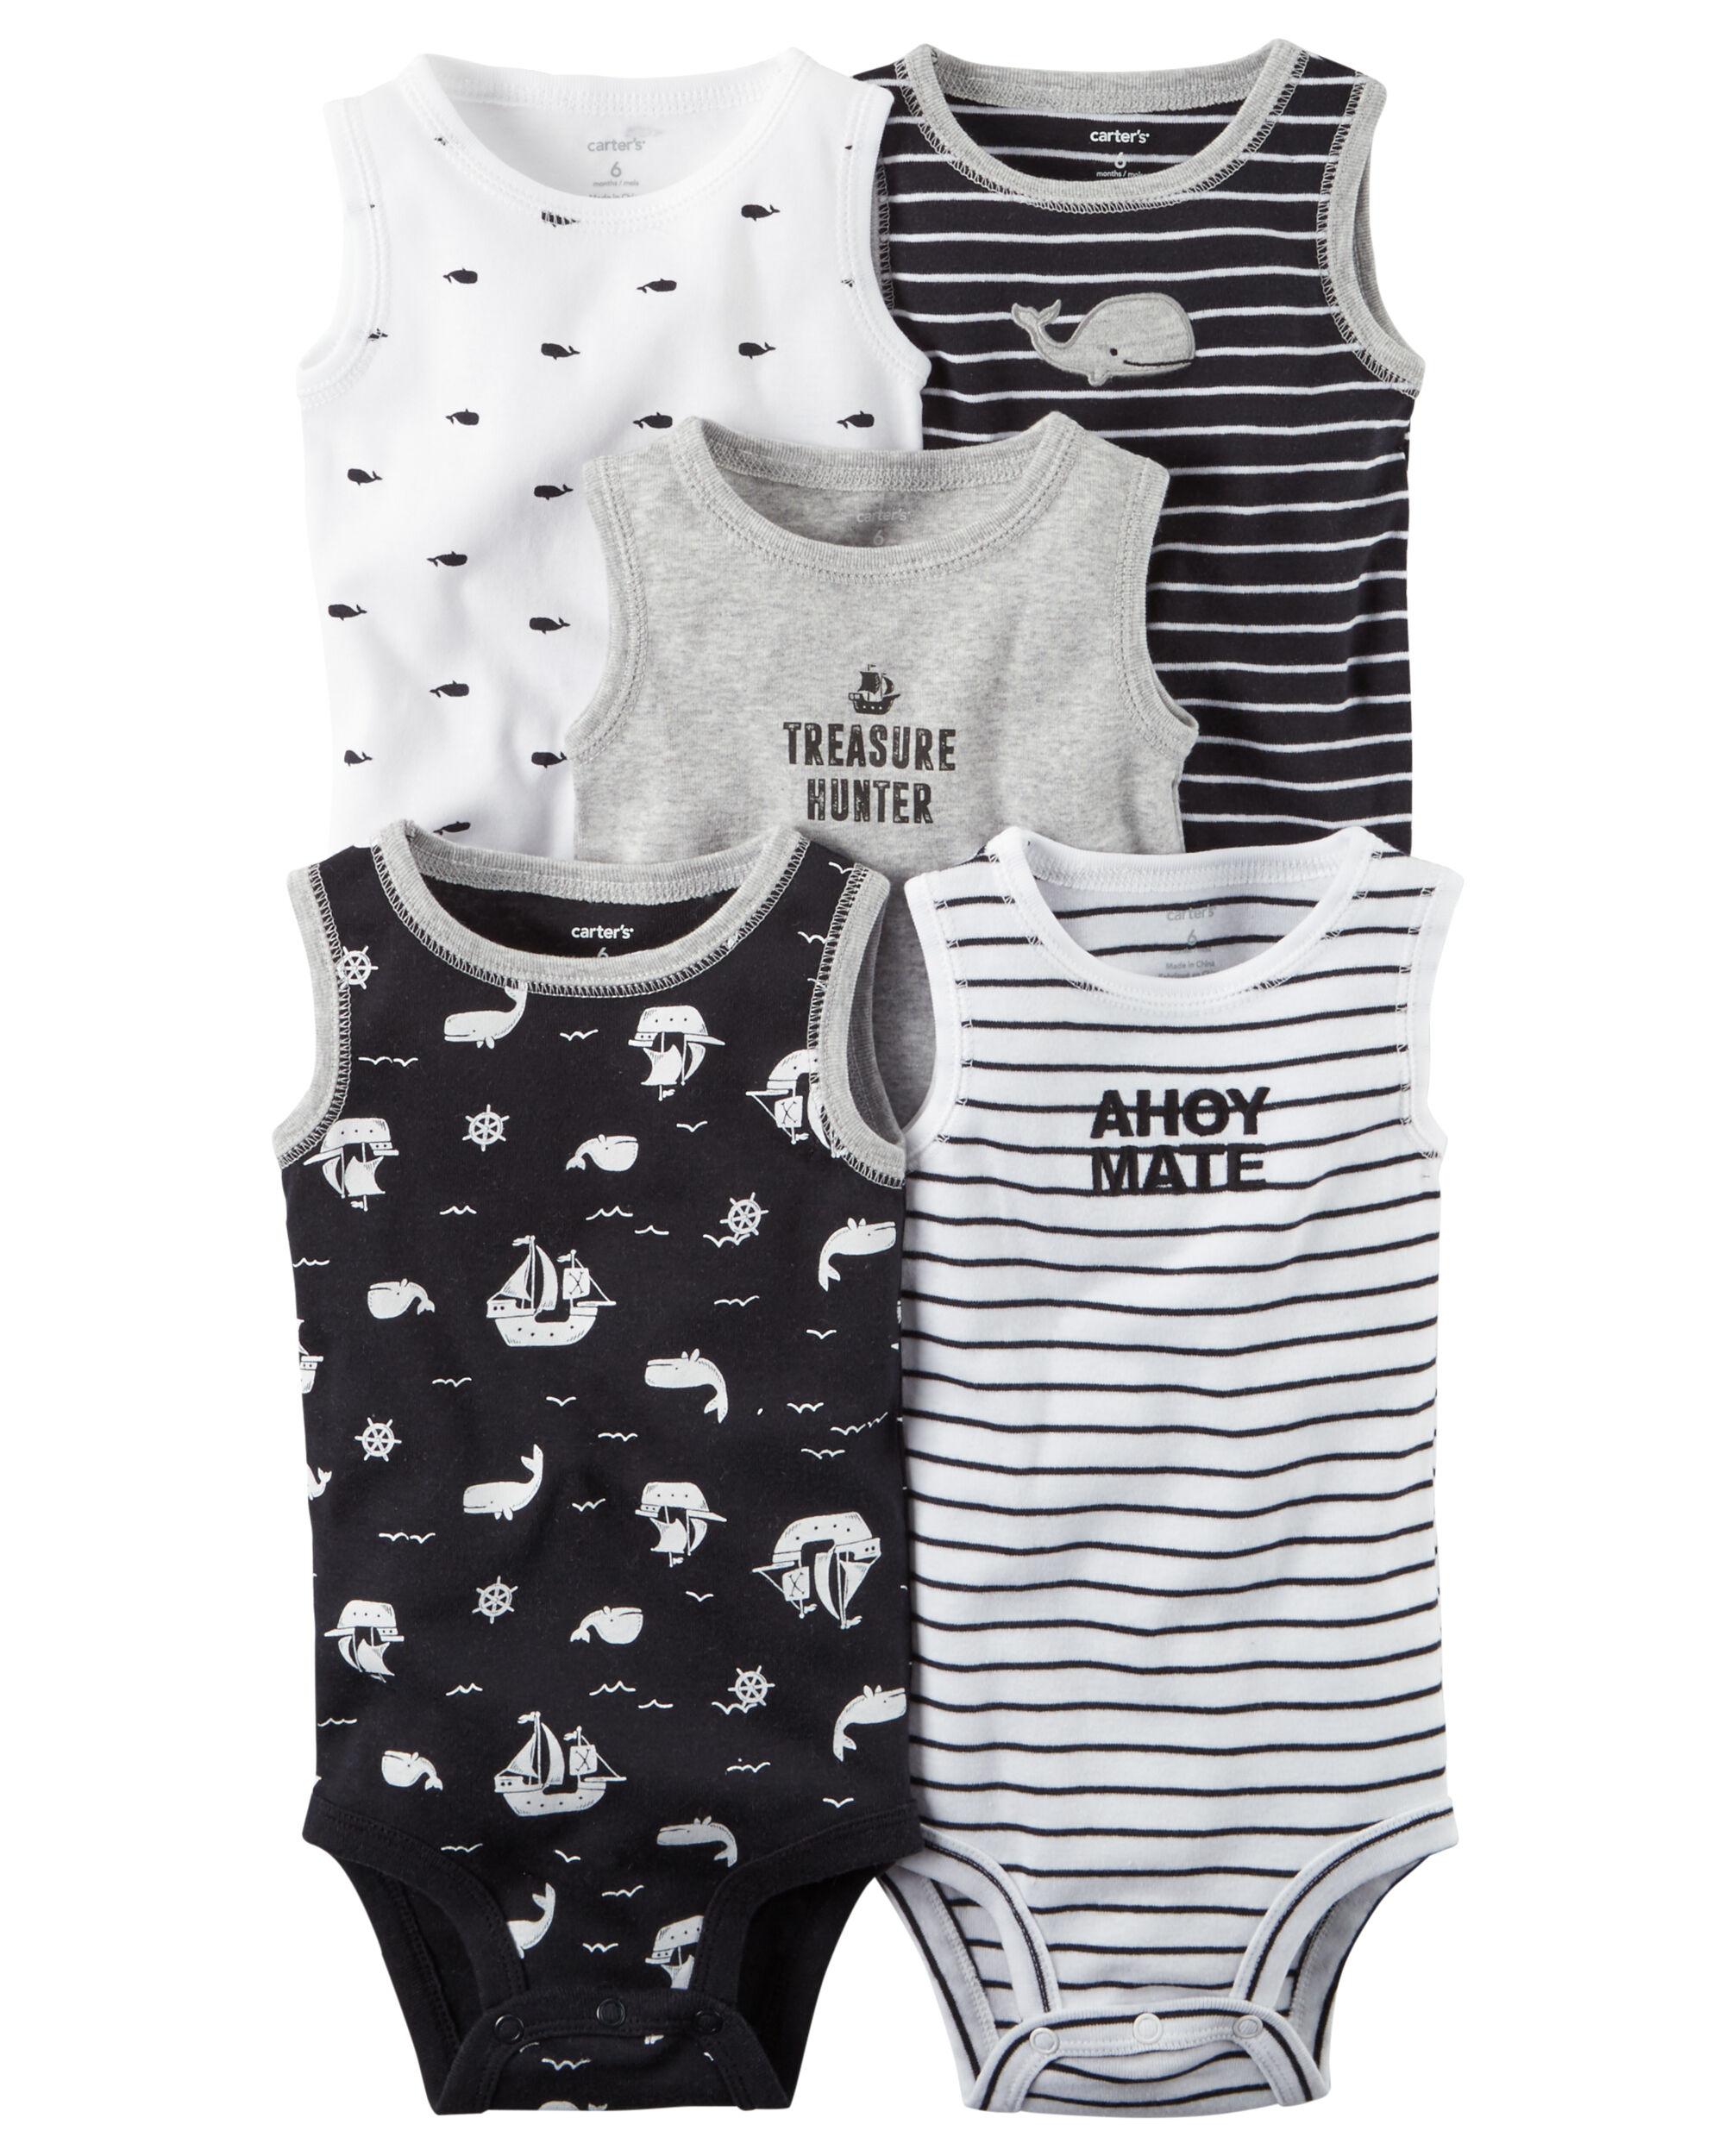 5 Pack Little Matey Sleeveless Original Bodysuits